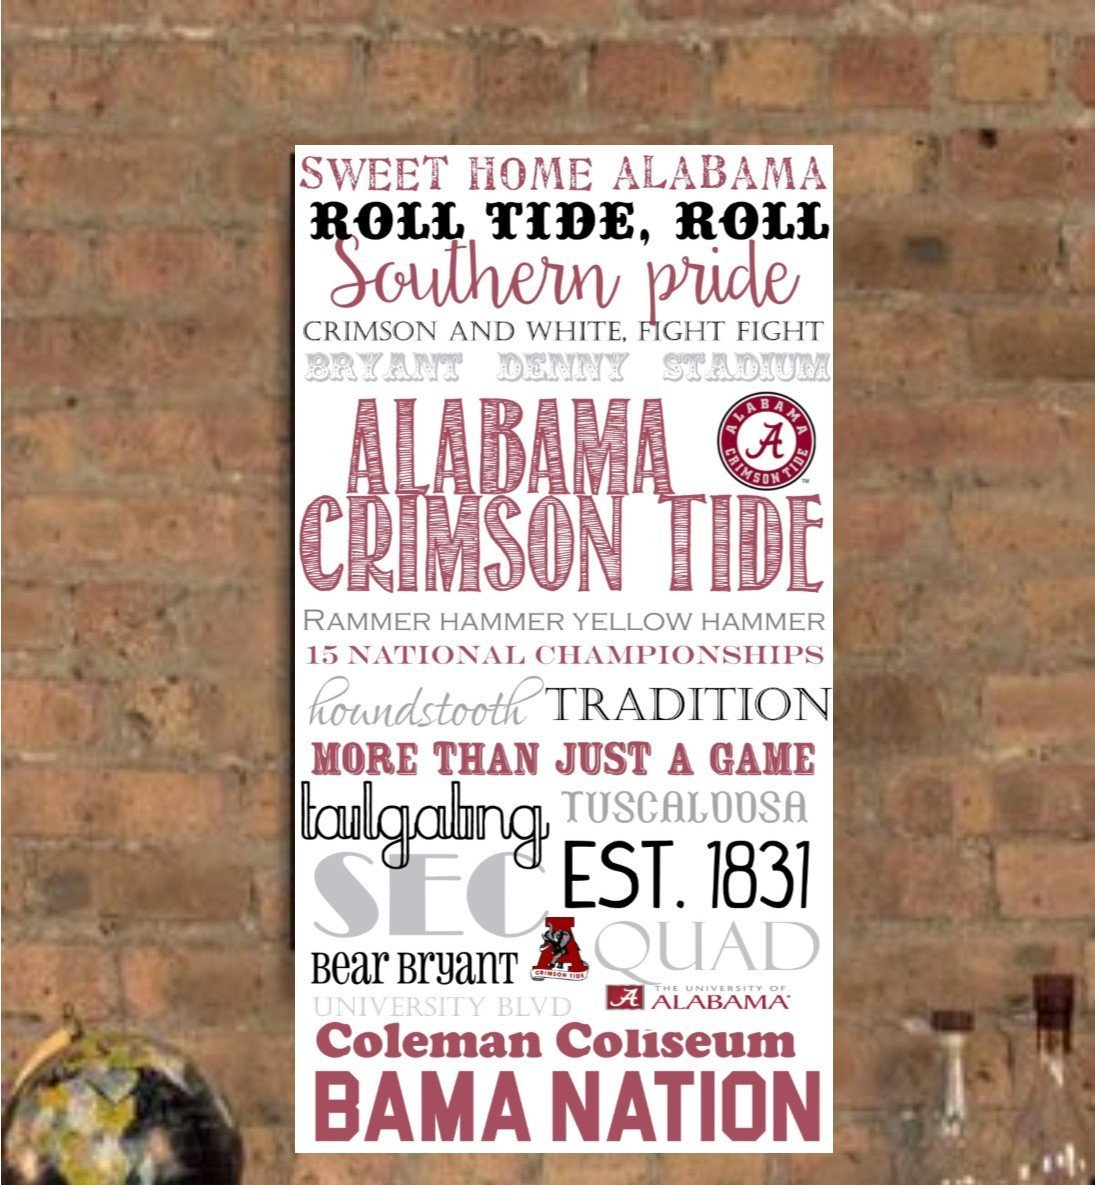 University of Alabama / Roll Tide/ Alabama/ Crimson Tide/ Tuscaloosa, AL Subway Art Canvas Print- can customize